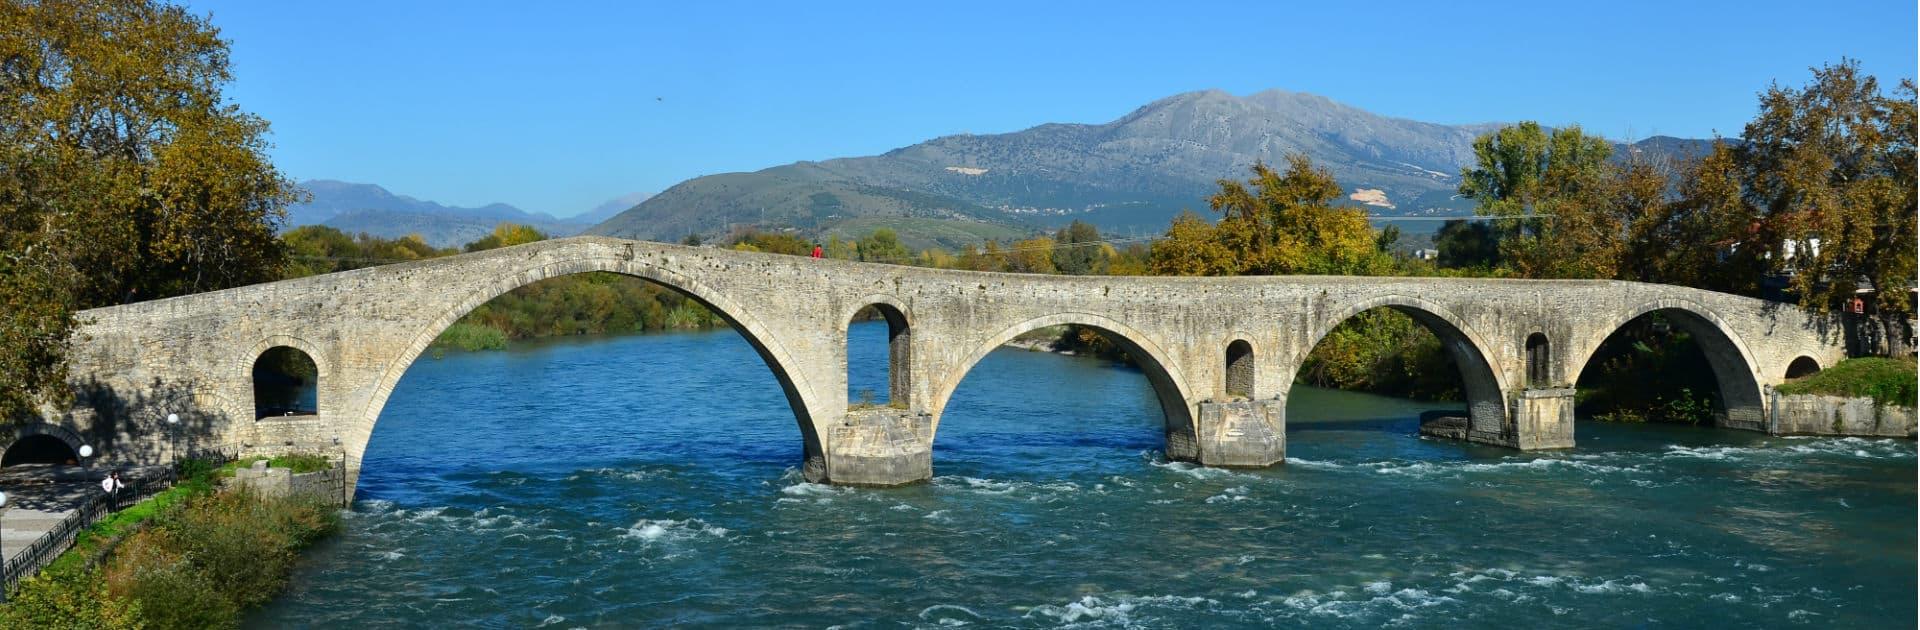 greek-bridges-athens-2004-banner